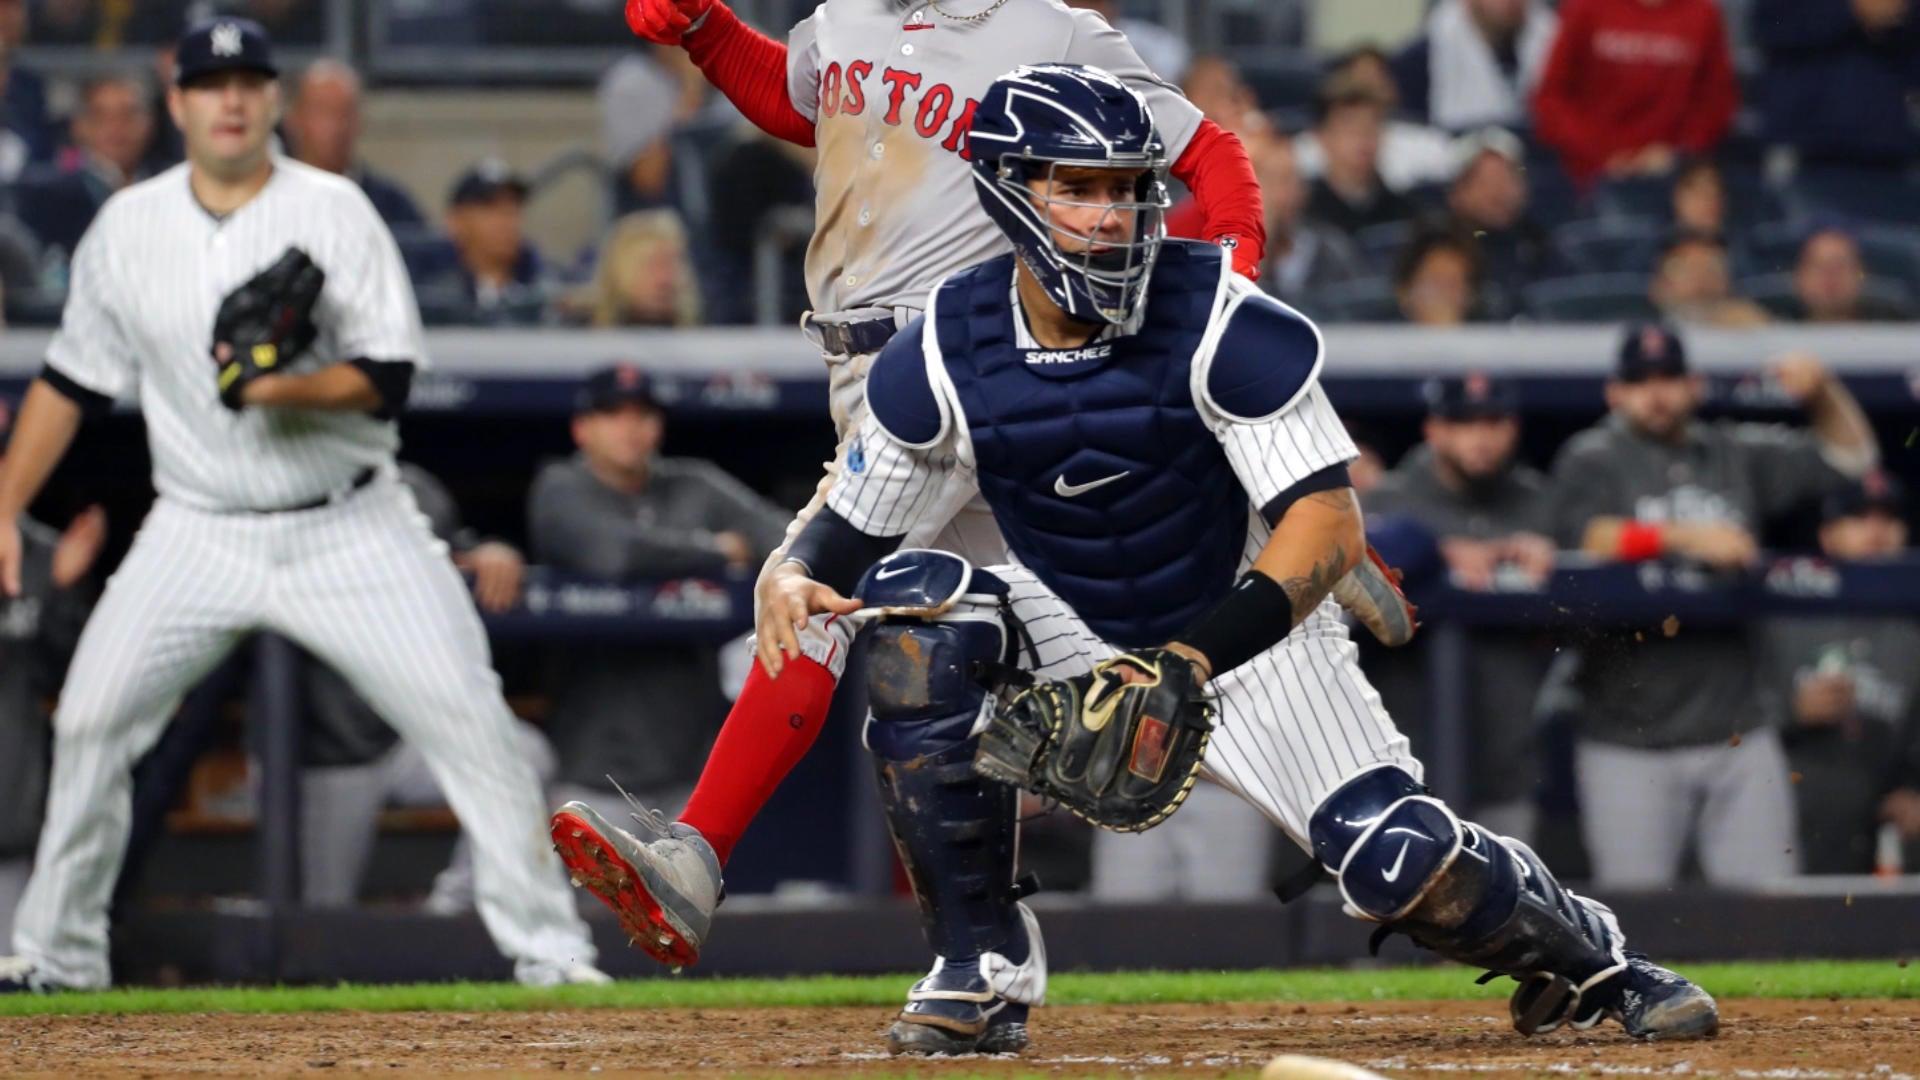 2019 Fantasy Baseball Draft Prep: Catcher Tiers, Version 2.0